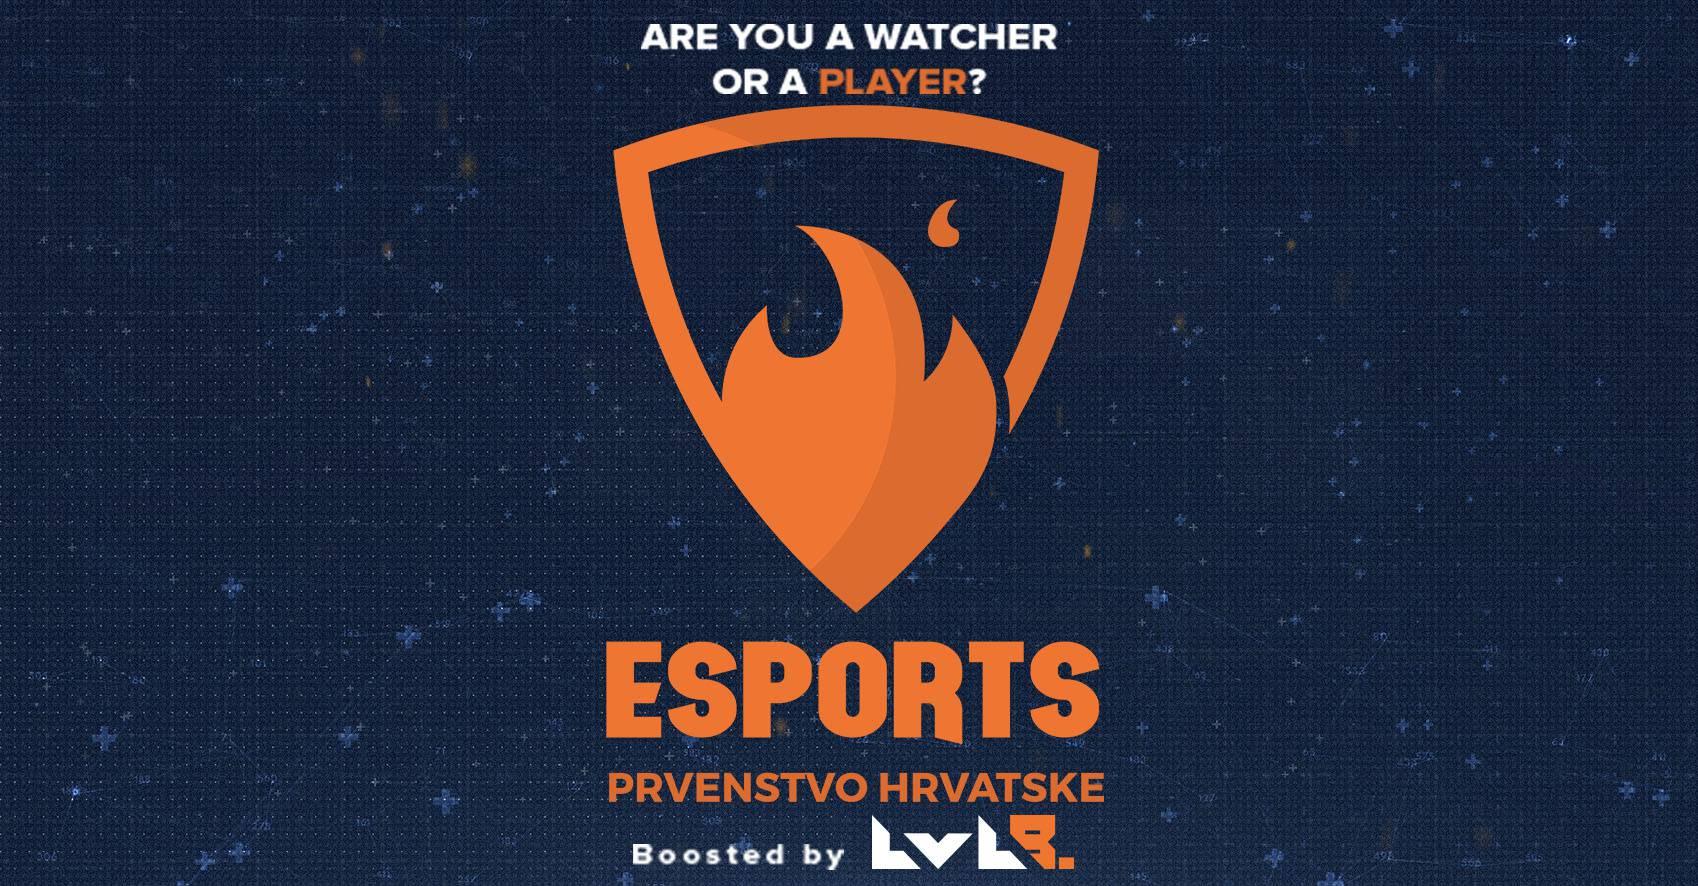 Esports prvenstvo Hrvatske: Igraj videoigre i osvoji nagrade